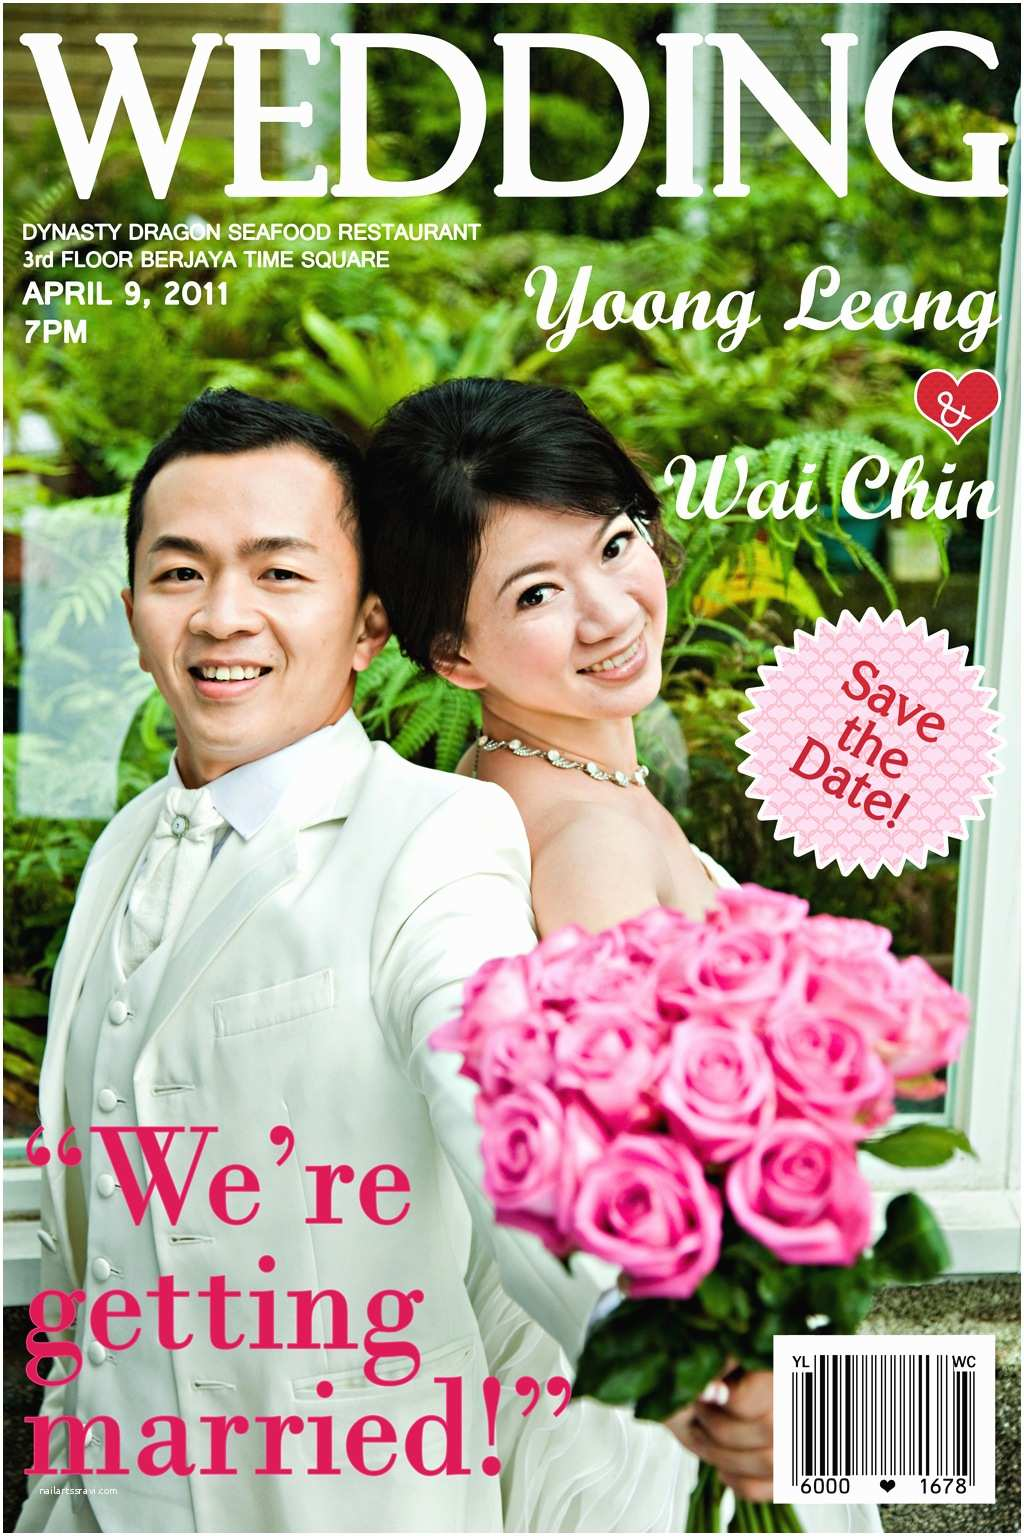 Magazine Wedding Invitation Wedding Invitation Card by Noelle Py at Coroflot